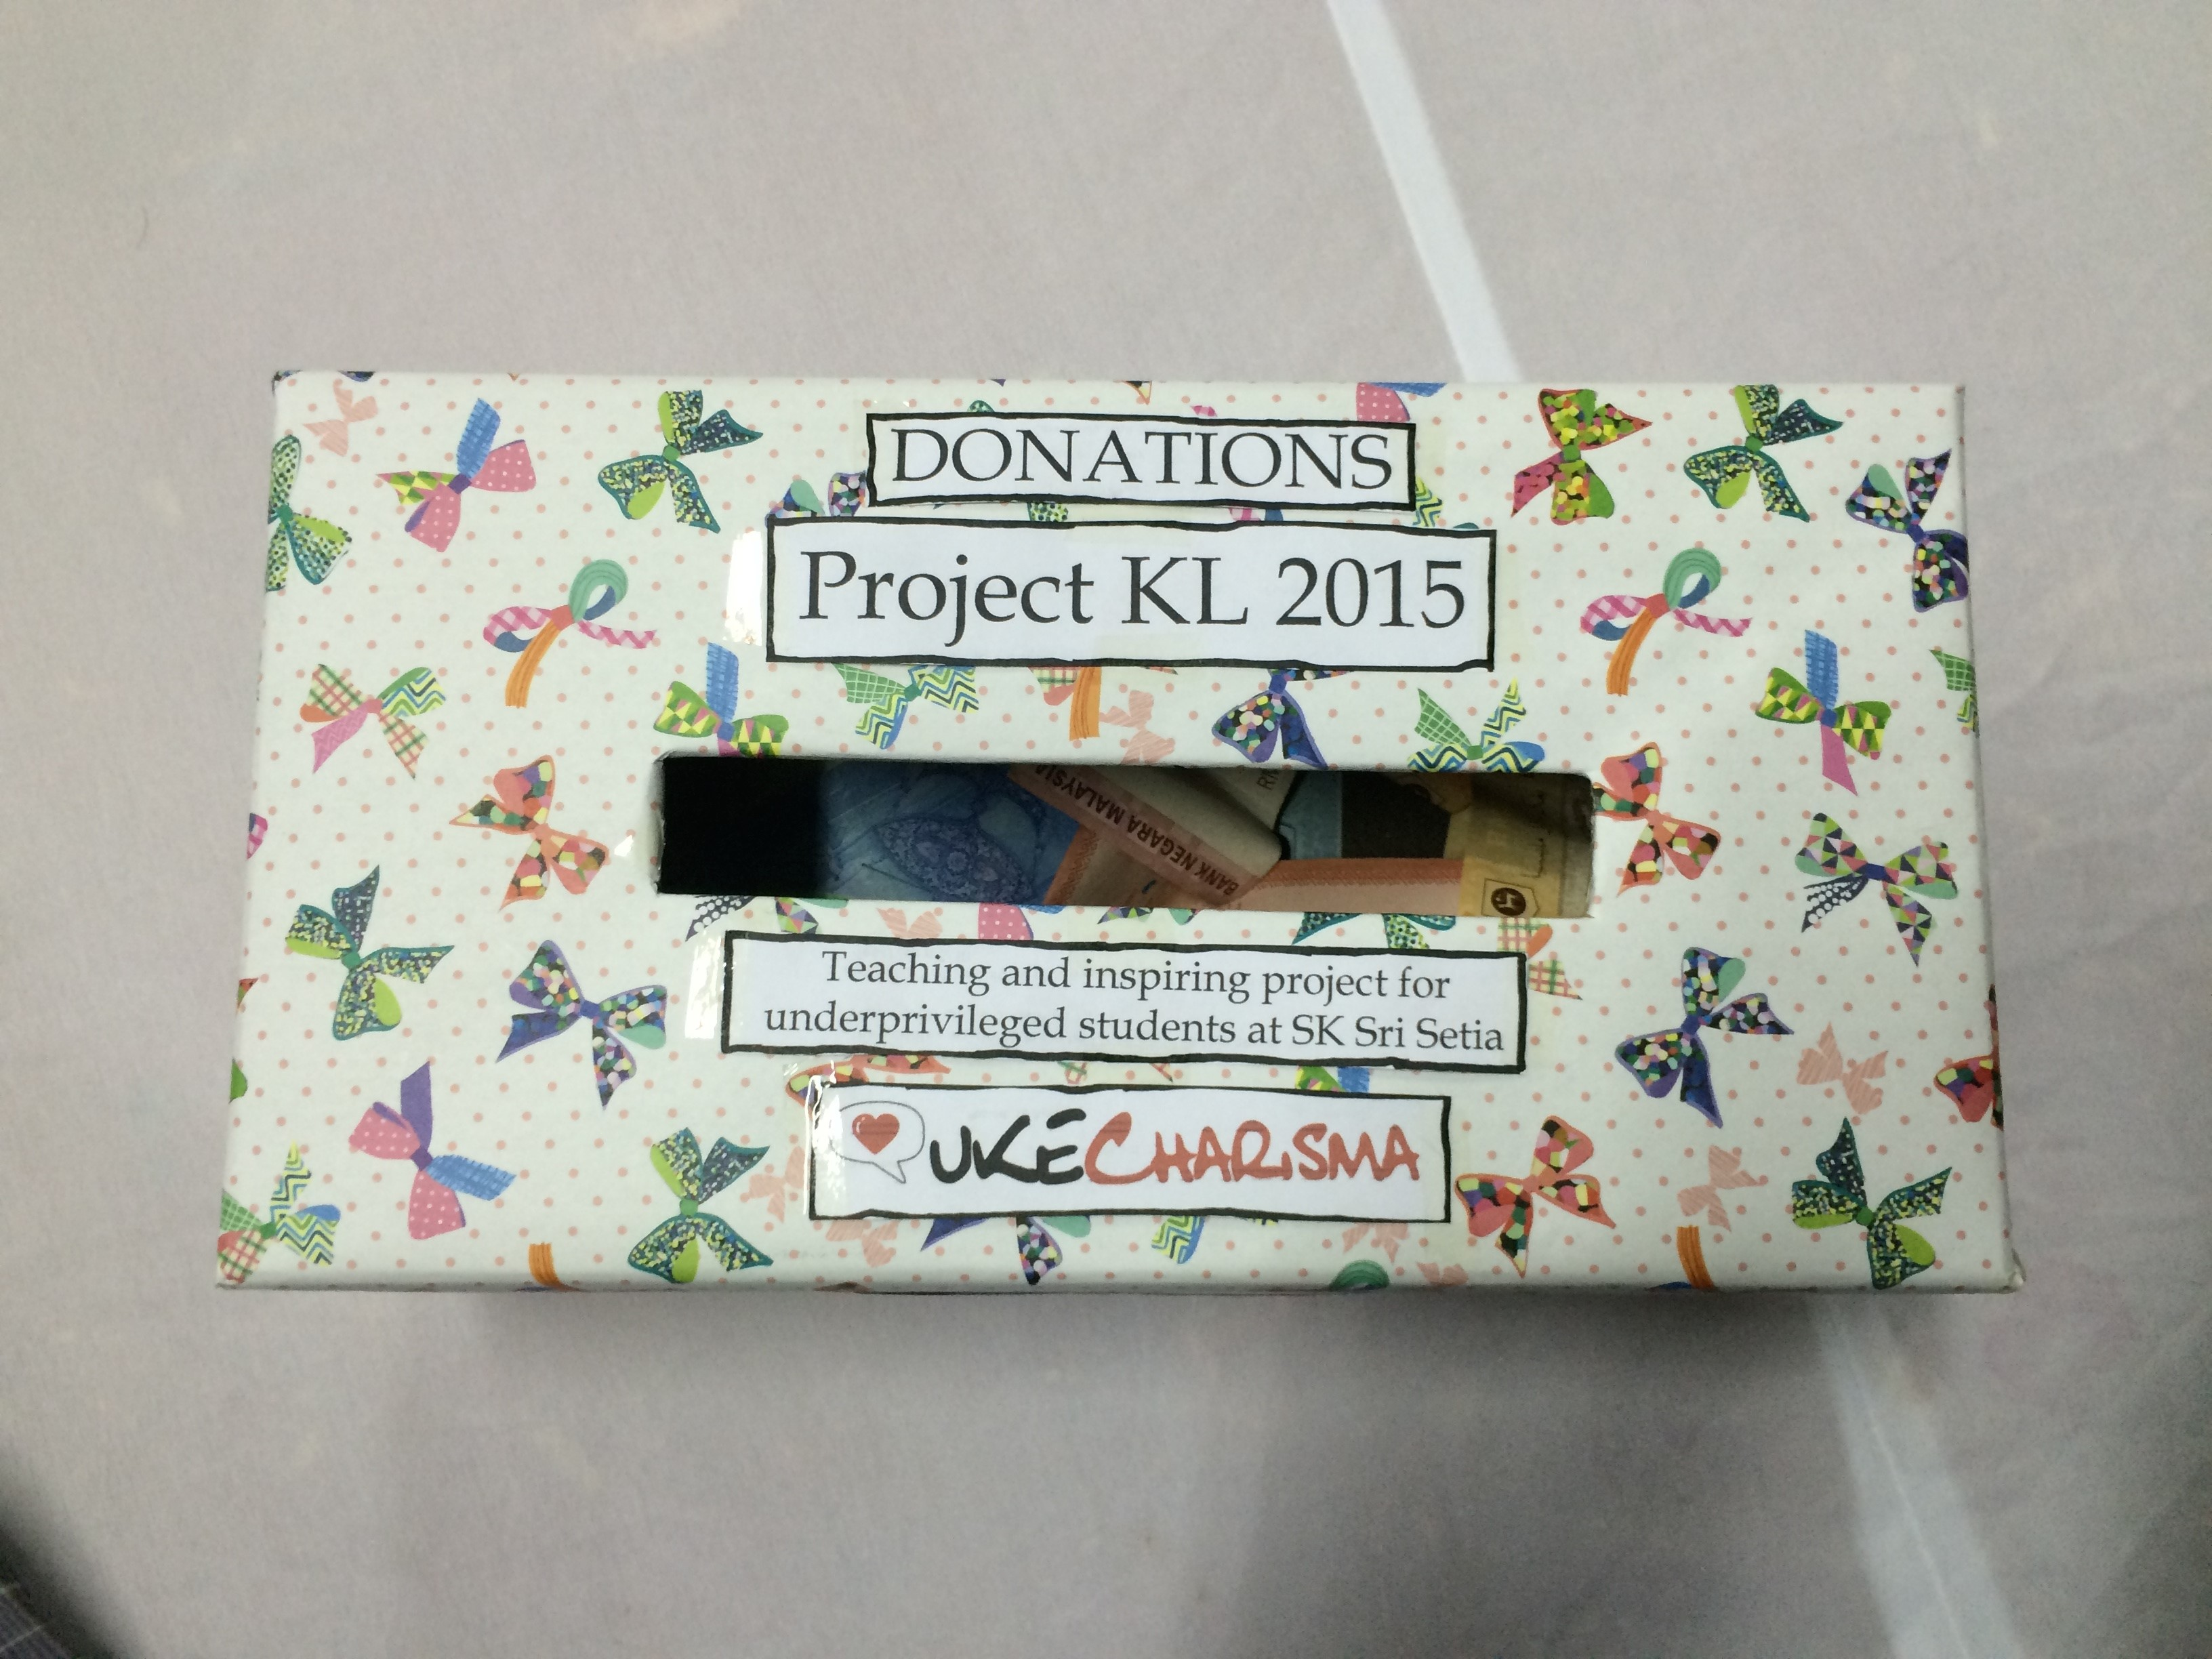 Nurul Jannahu0027s donation box. & Fundraising Ideas u2013 Charisma Movement Aboutintivar.Com